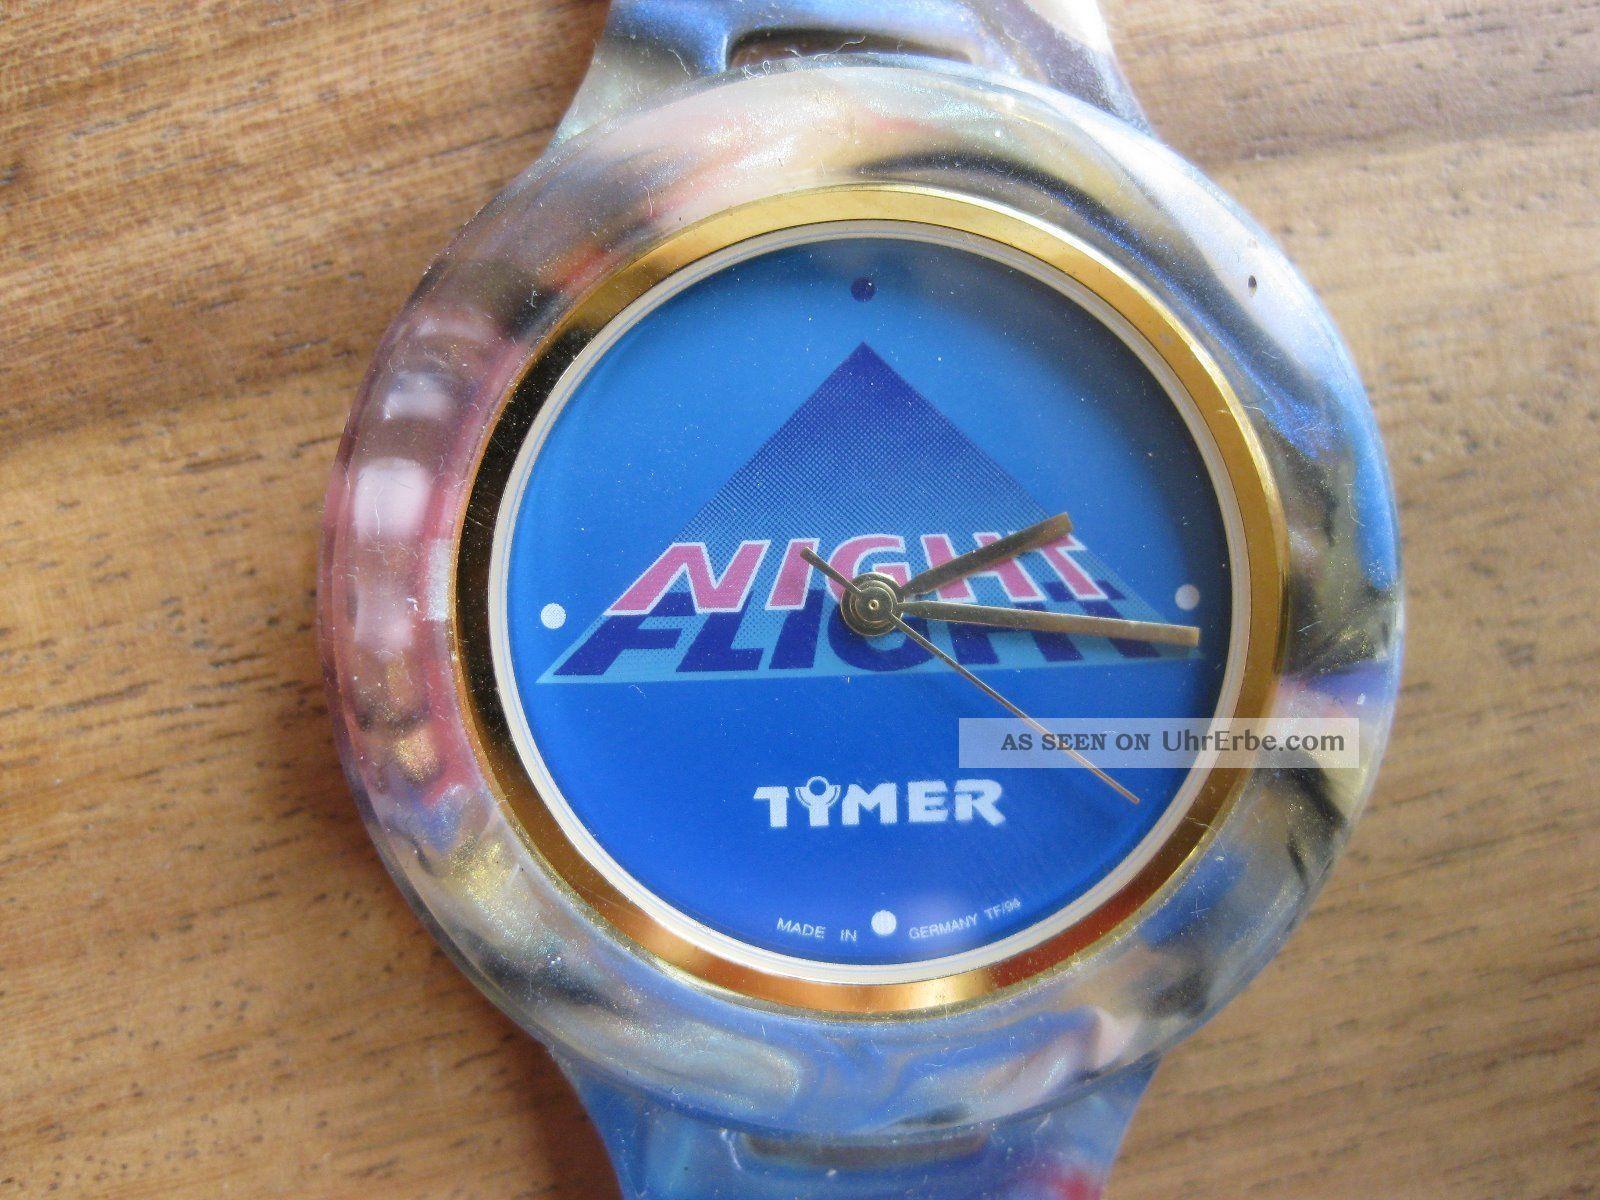 Tymer Uhr Night Flight Mit Kautschukband Armbanduhr Werbeuhr Armbanduhren Bild